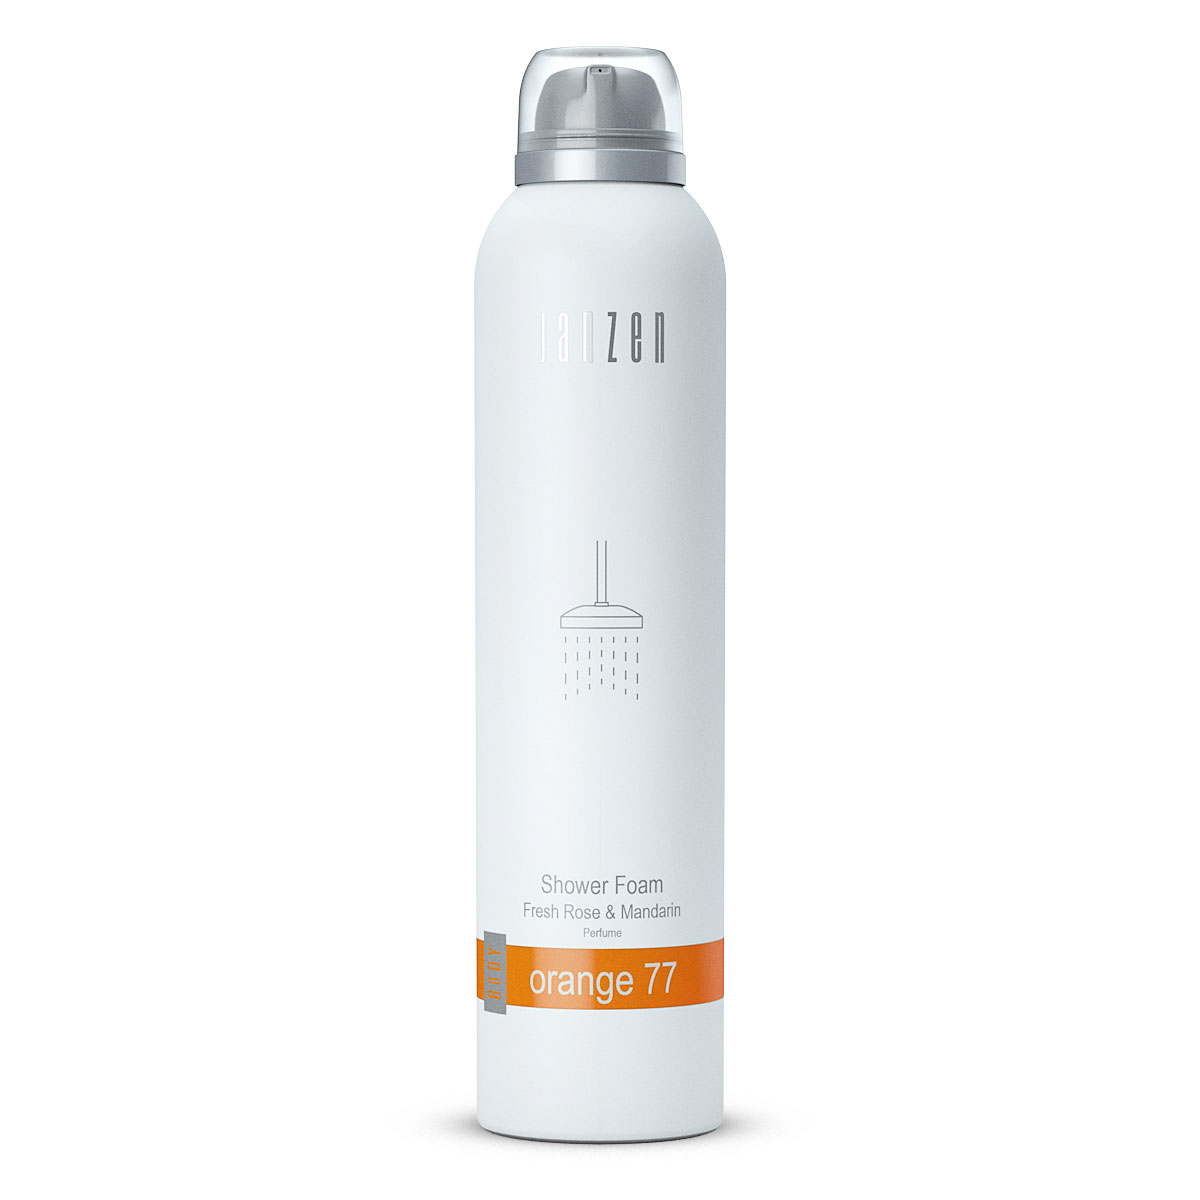 Janzen Shower Foam Orange 77